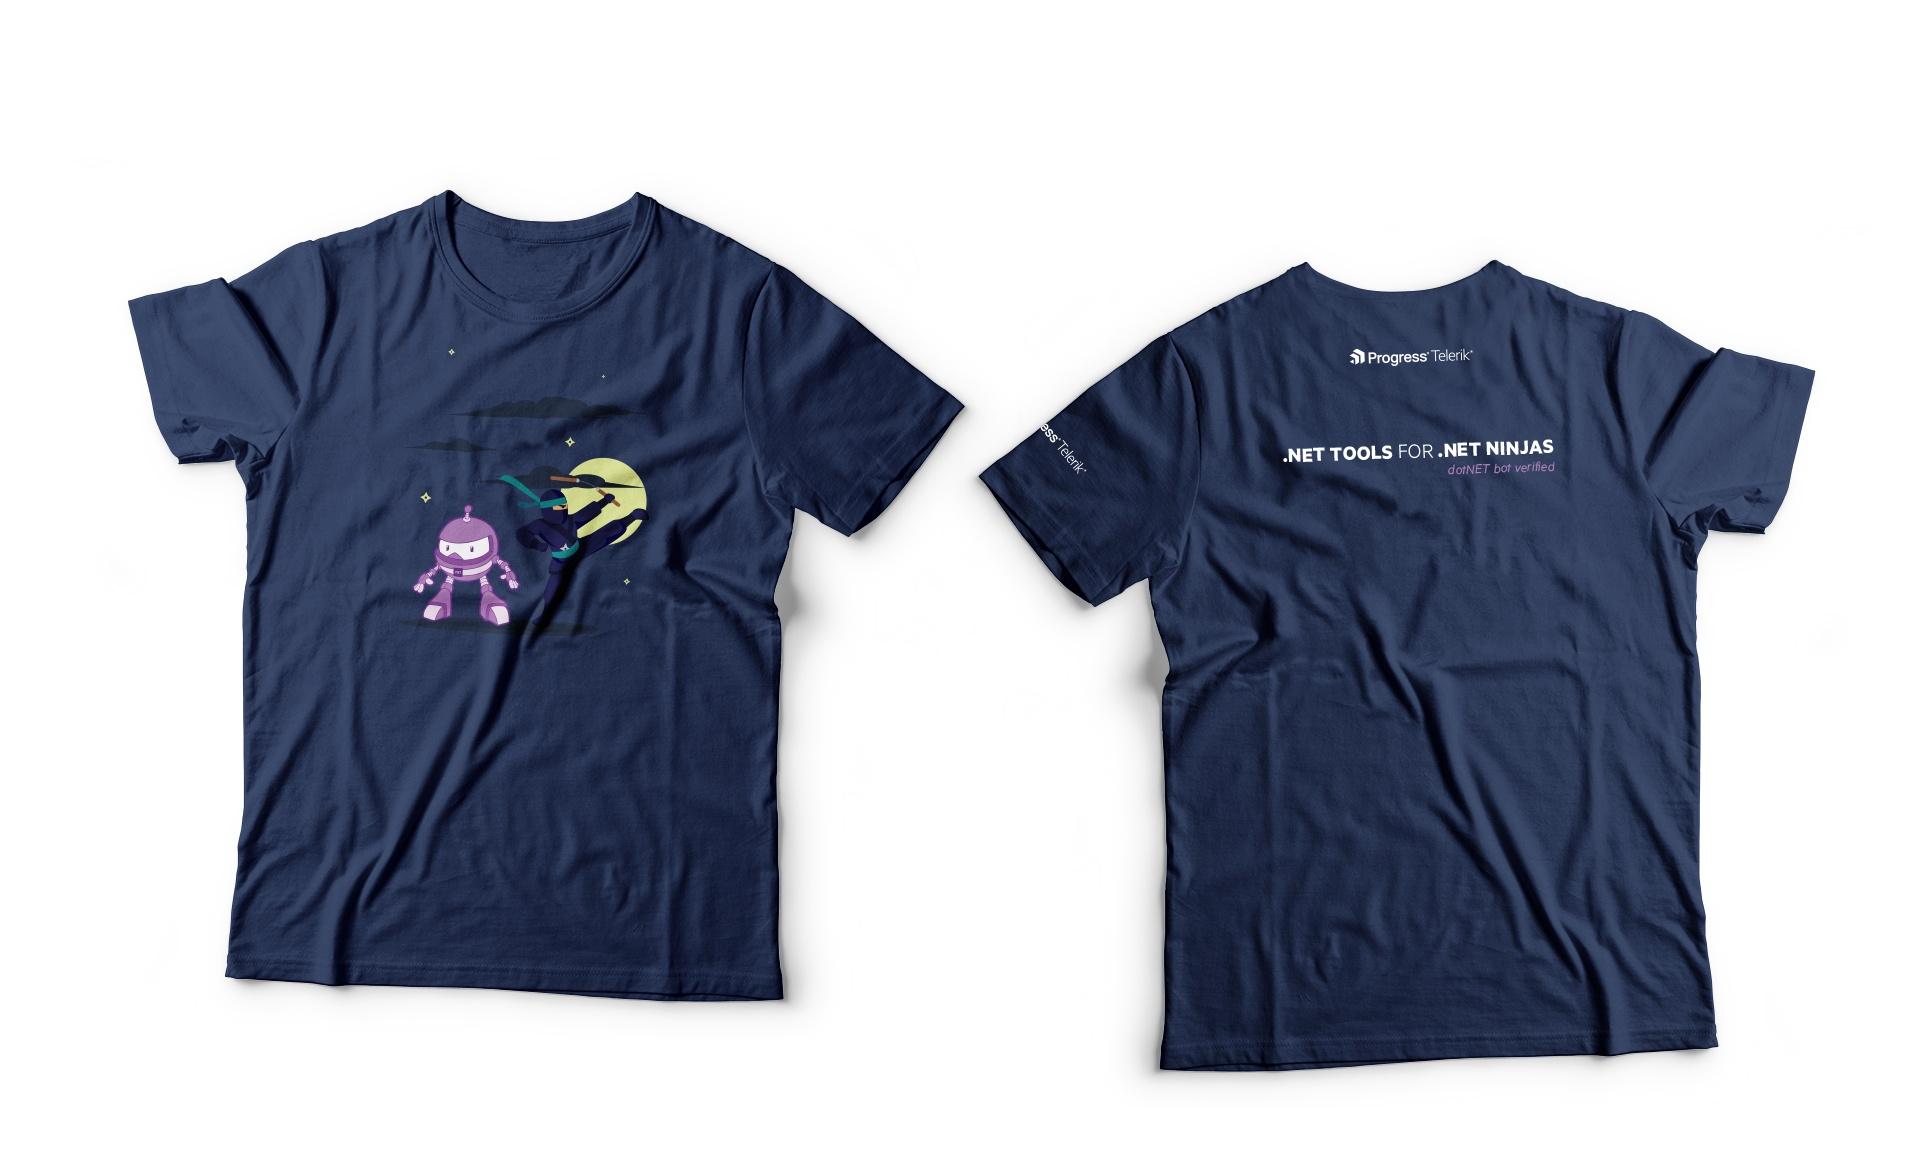 T-Shirt-Mockup1.2.1